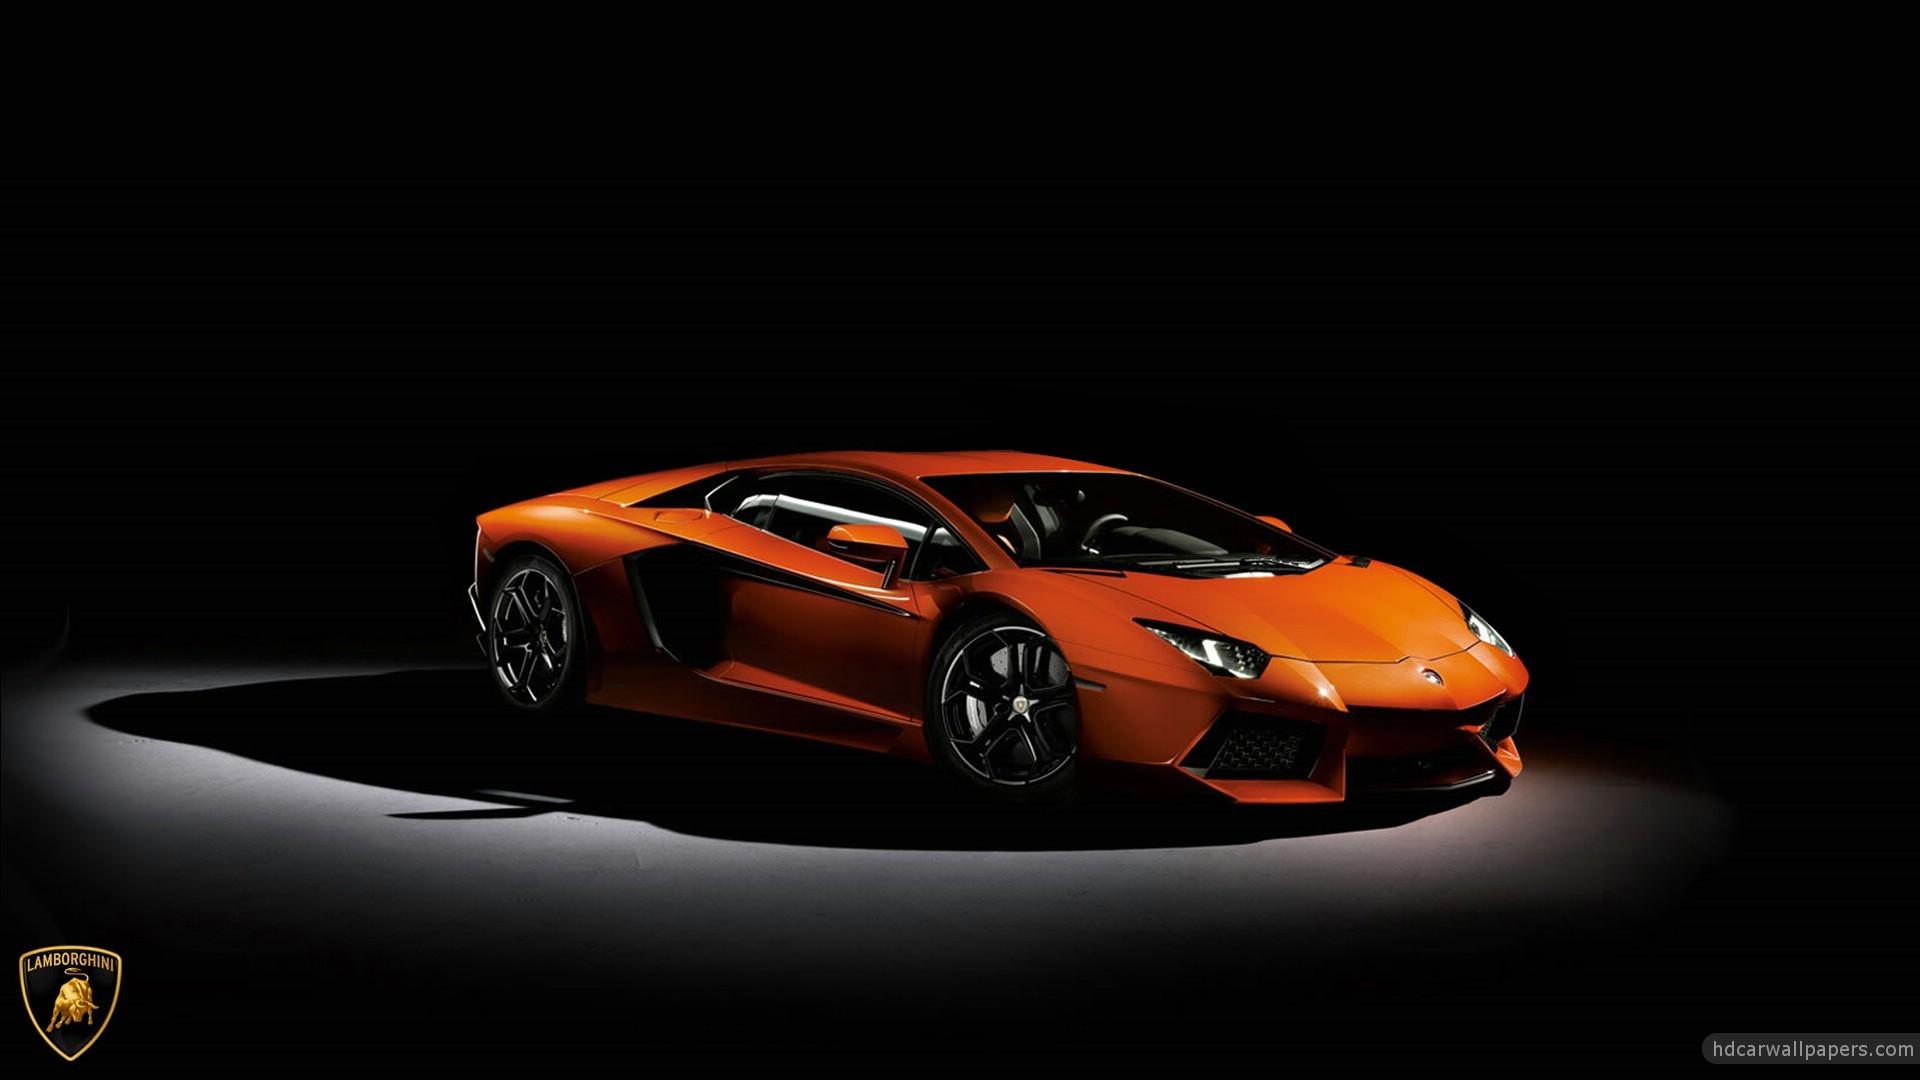 1920x1080 Lamborghini Aventador HD Wallpaper | HD Car Wallpapers